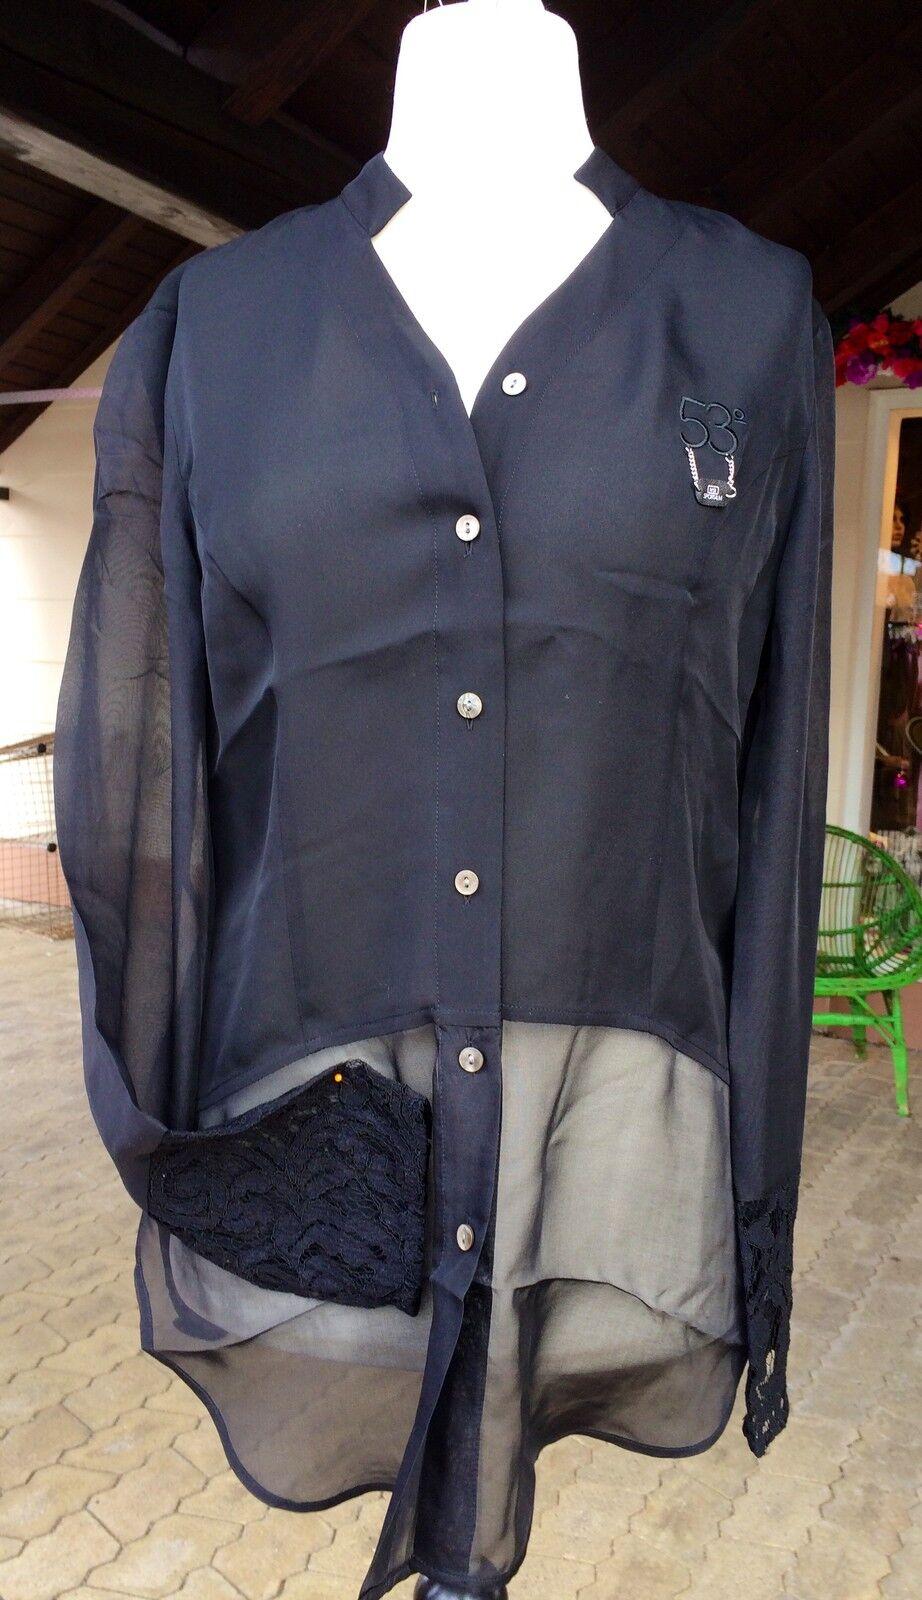 Sportalm Blause, schwarz, Blossom Grün, Niley, Gr. 38, Shirt, Spitze, Seide